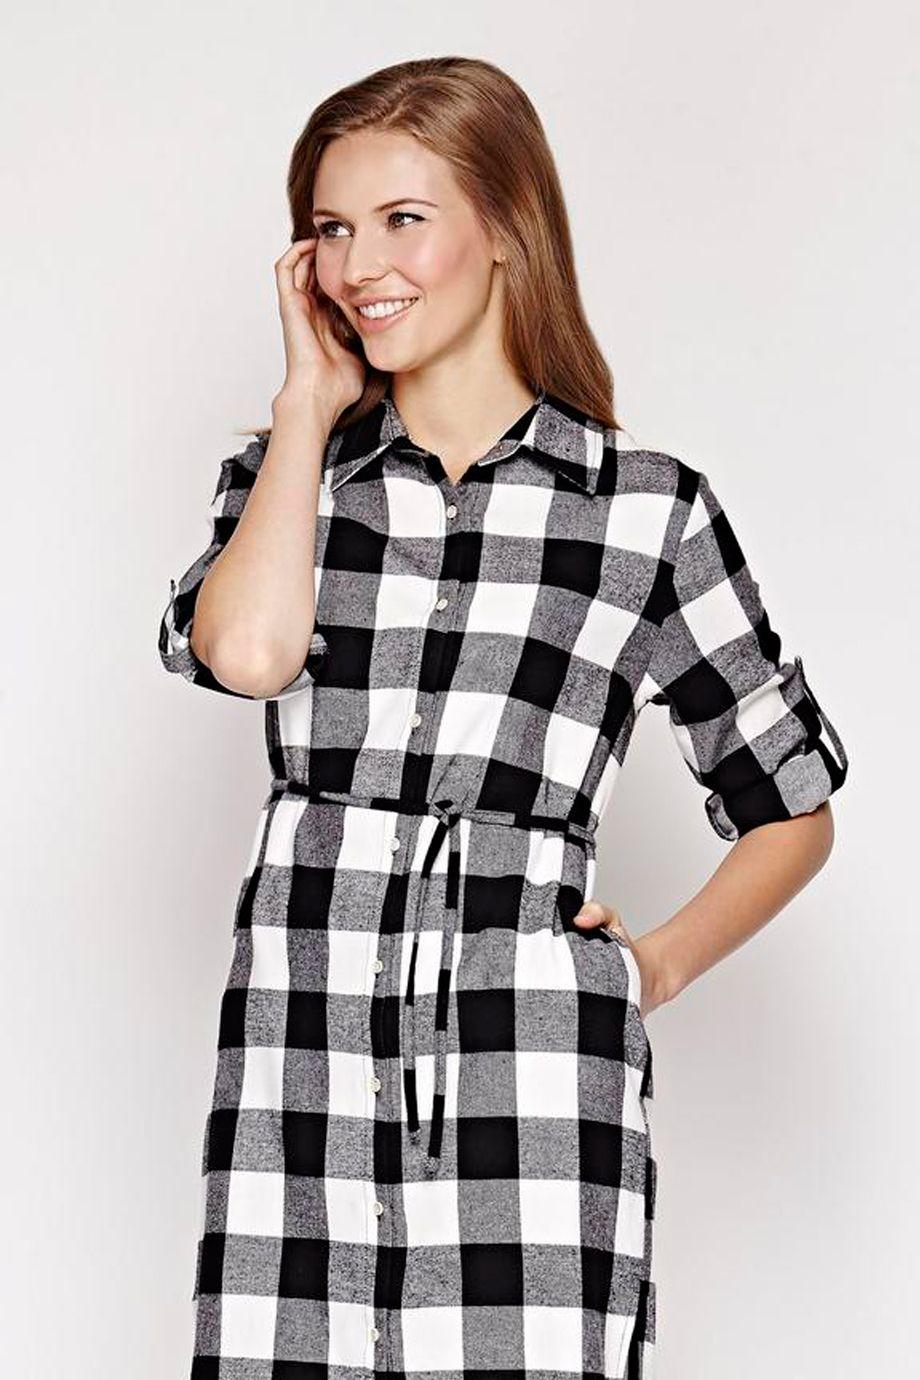 aa6cec7db639 Ασπρομαυρο καρo σεμιζιε φορεμα σε ισια γραμμη